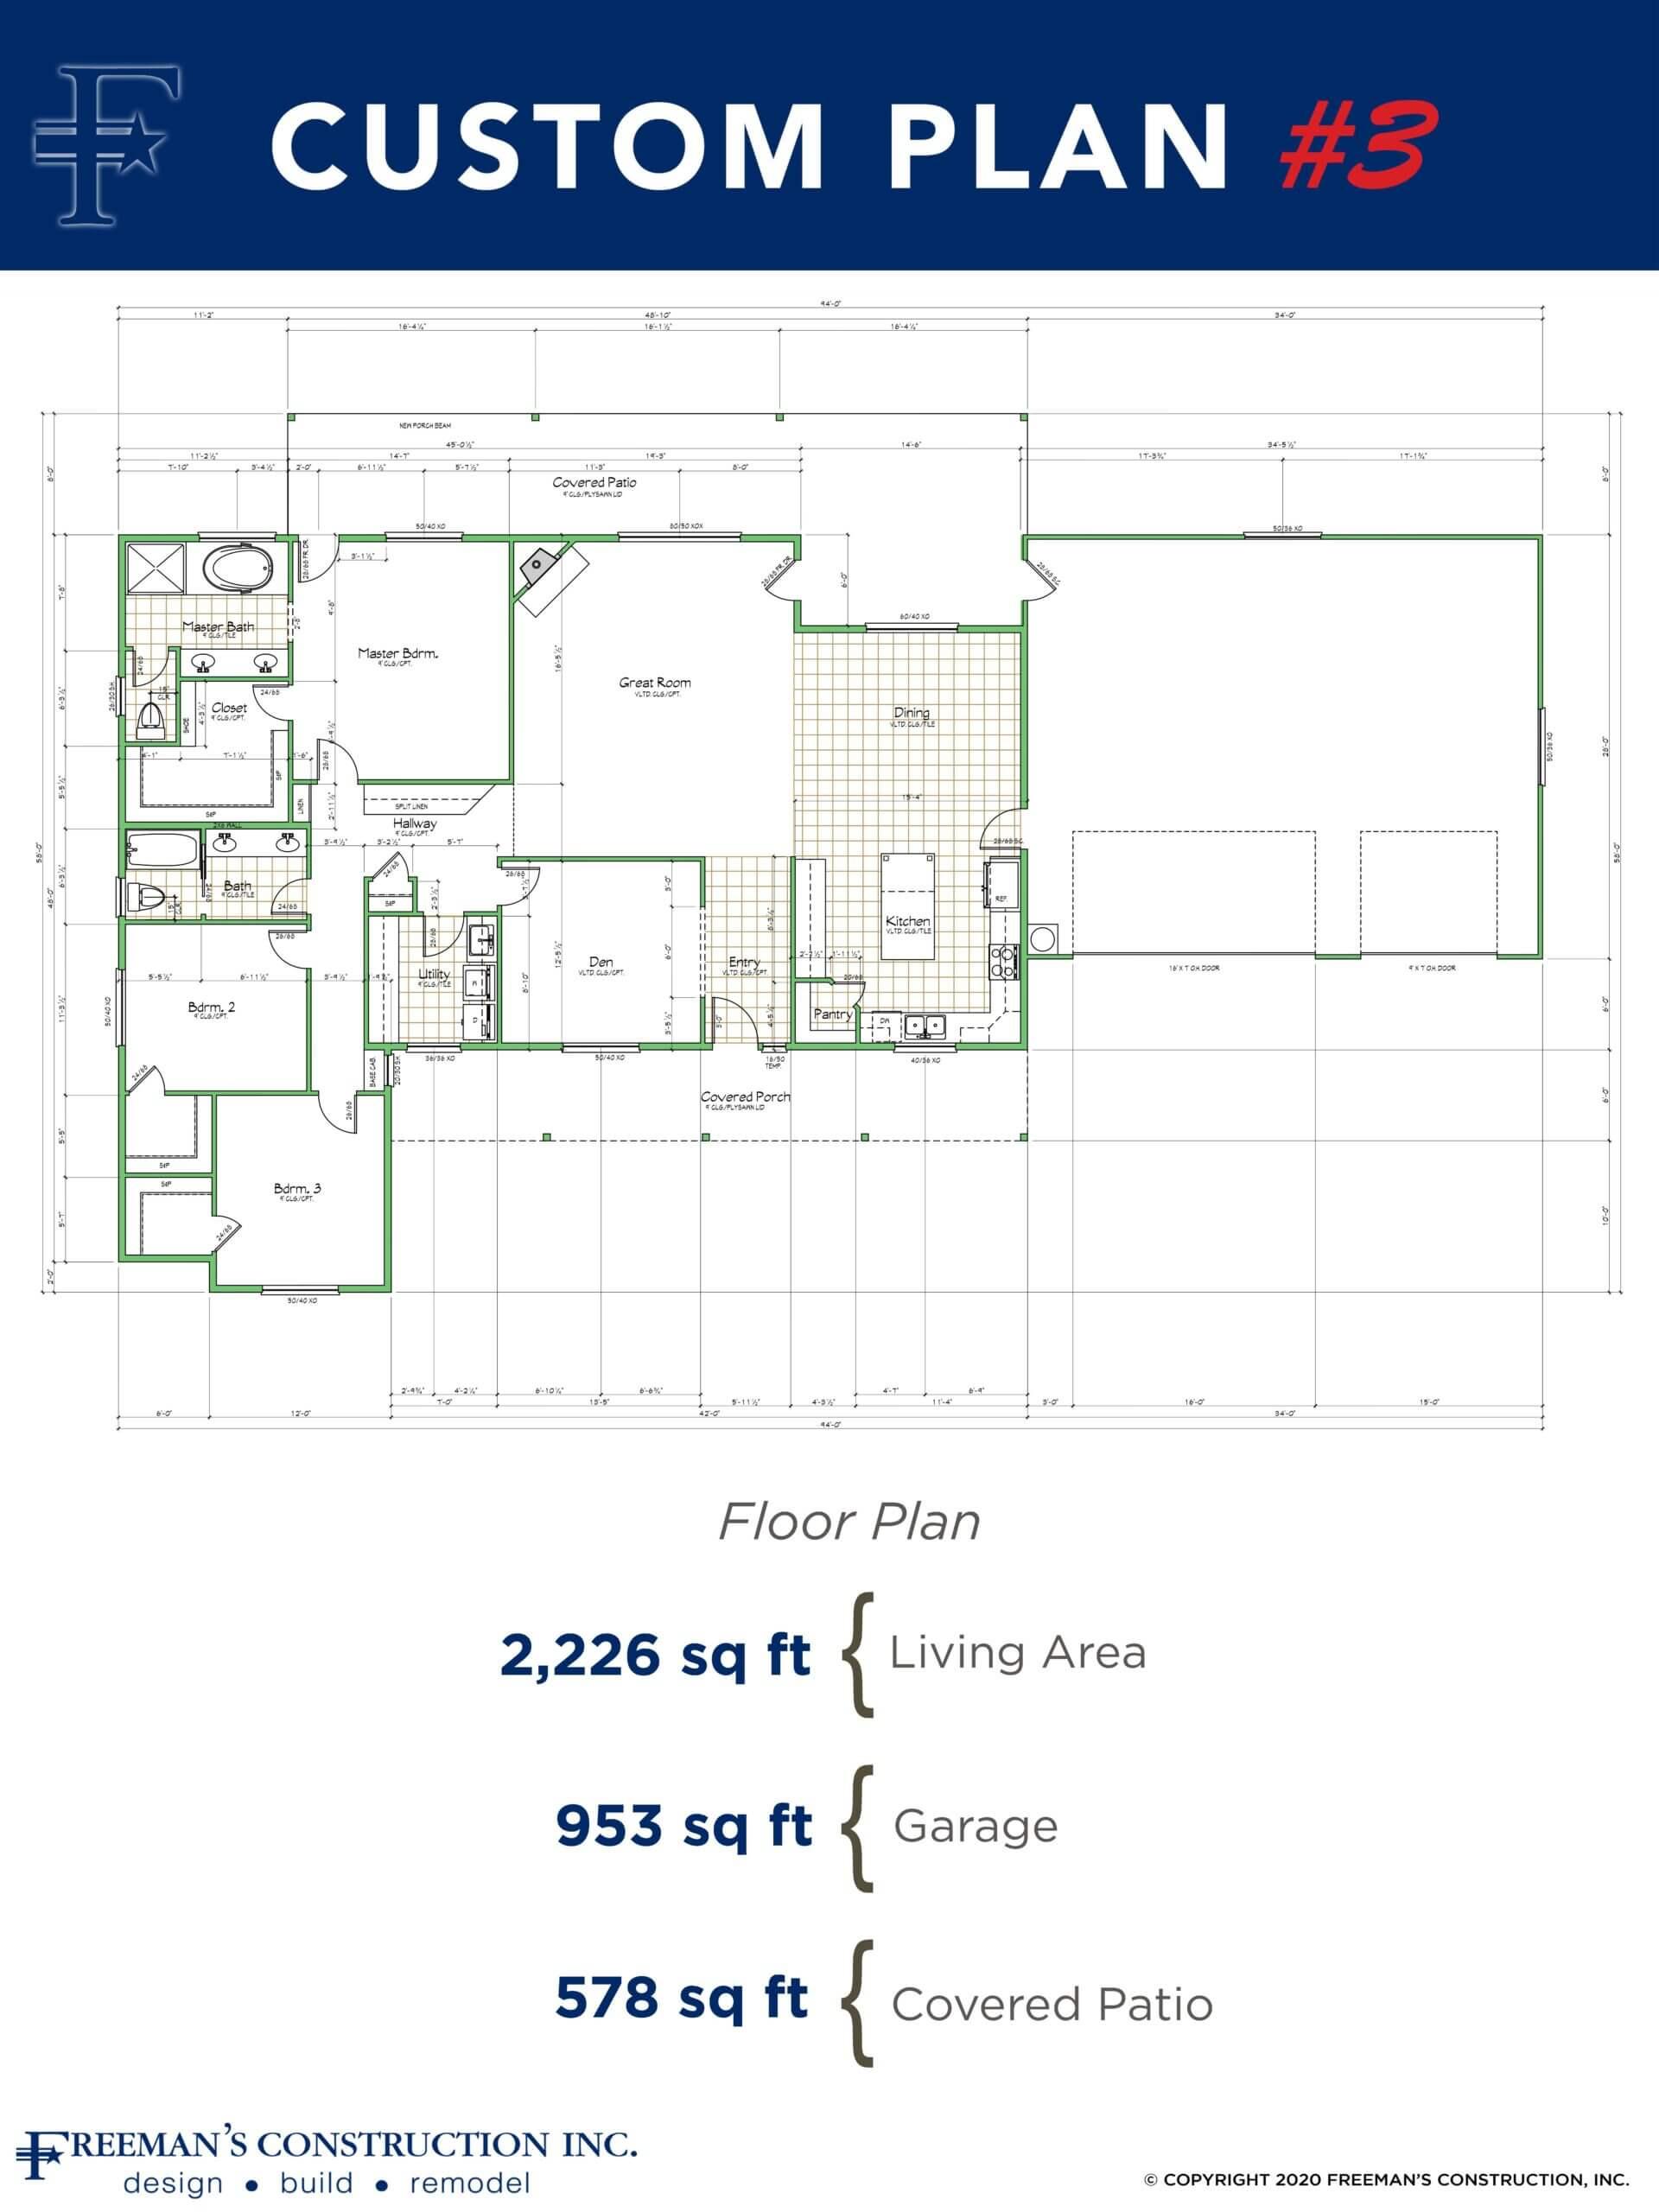 custom-home-floor-plan-3-in-san-diego-county-ca-by-freemans-construction-inc